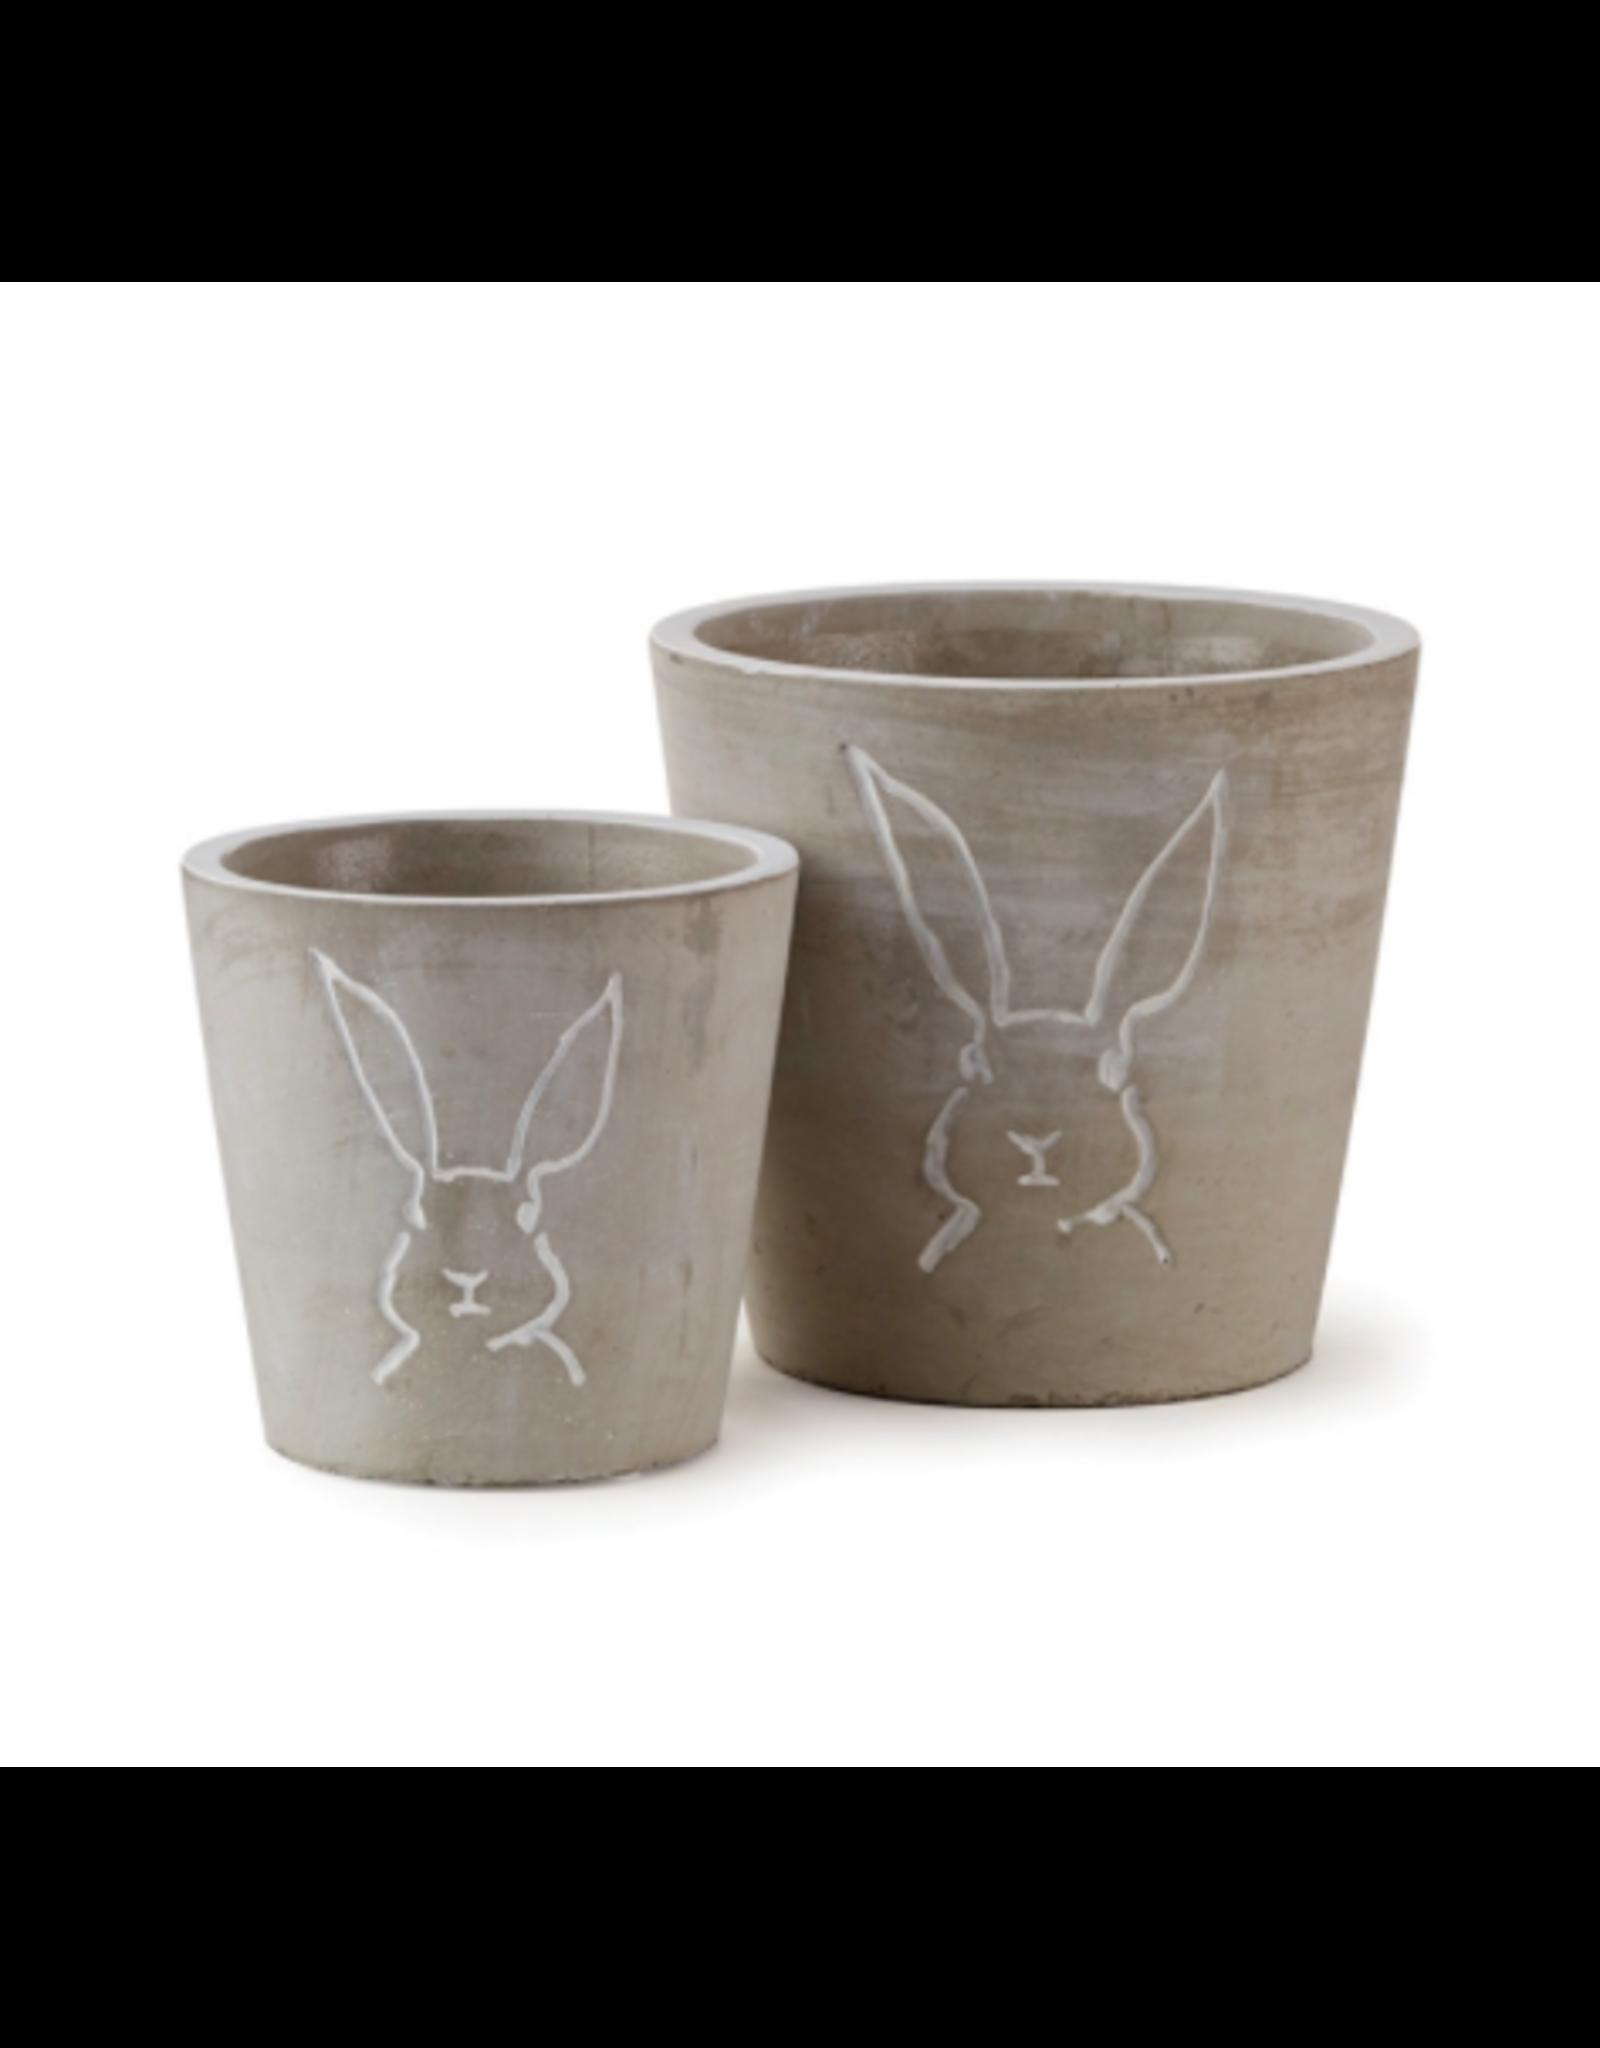 Napa Home & Garden Peter Rabbit Cachepot 4.25 x 4.25 x 4